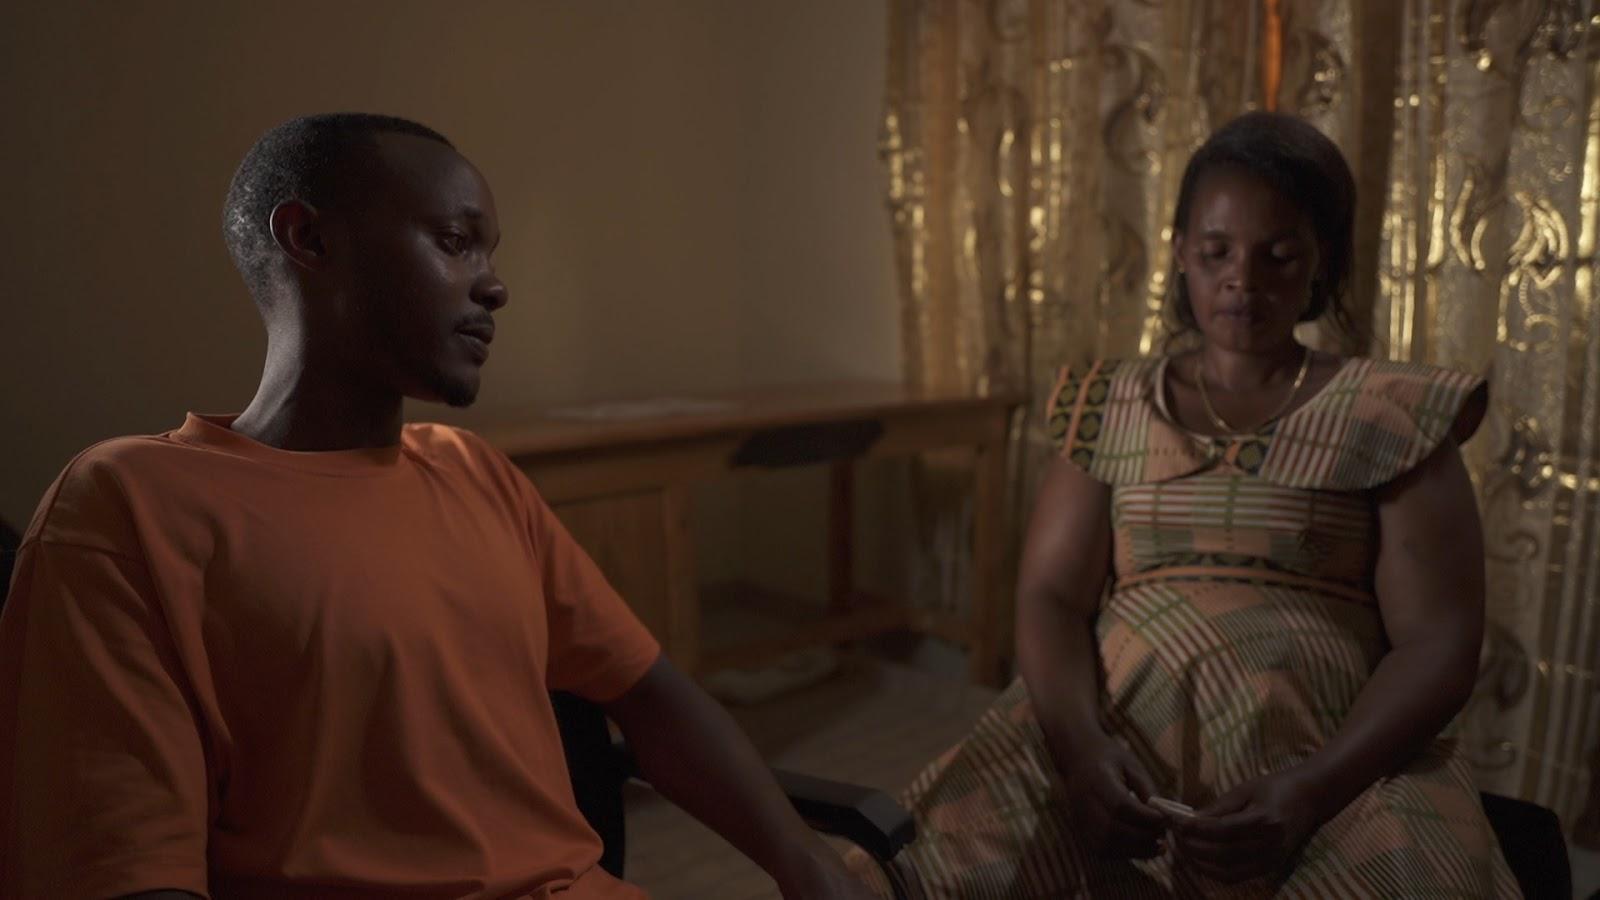 Rwanda, un génocide en héritage, de André Versaille